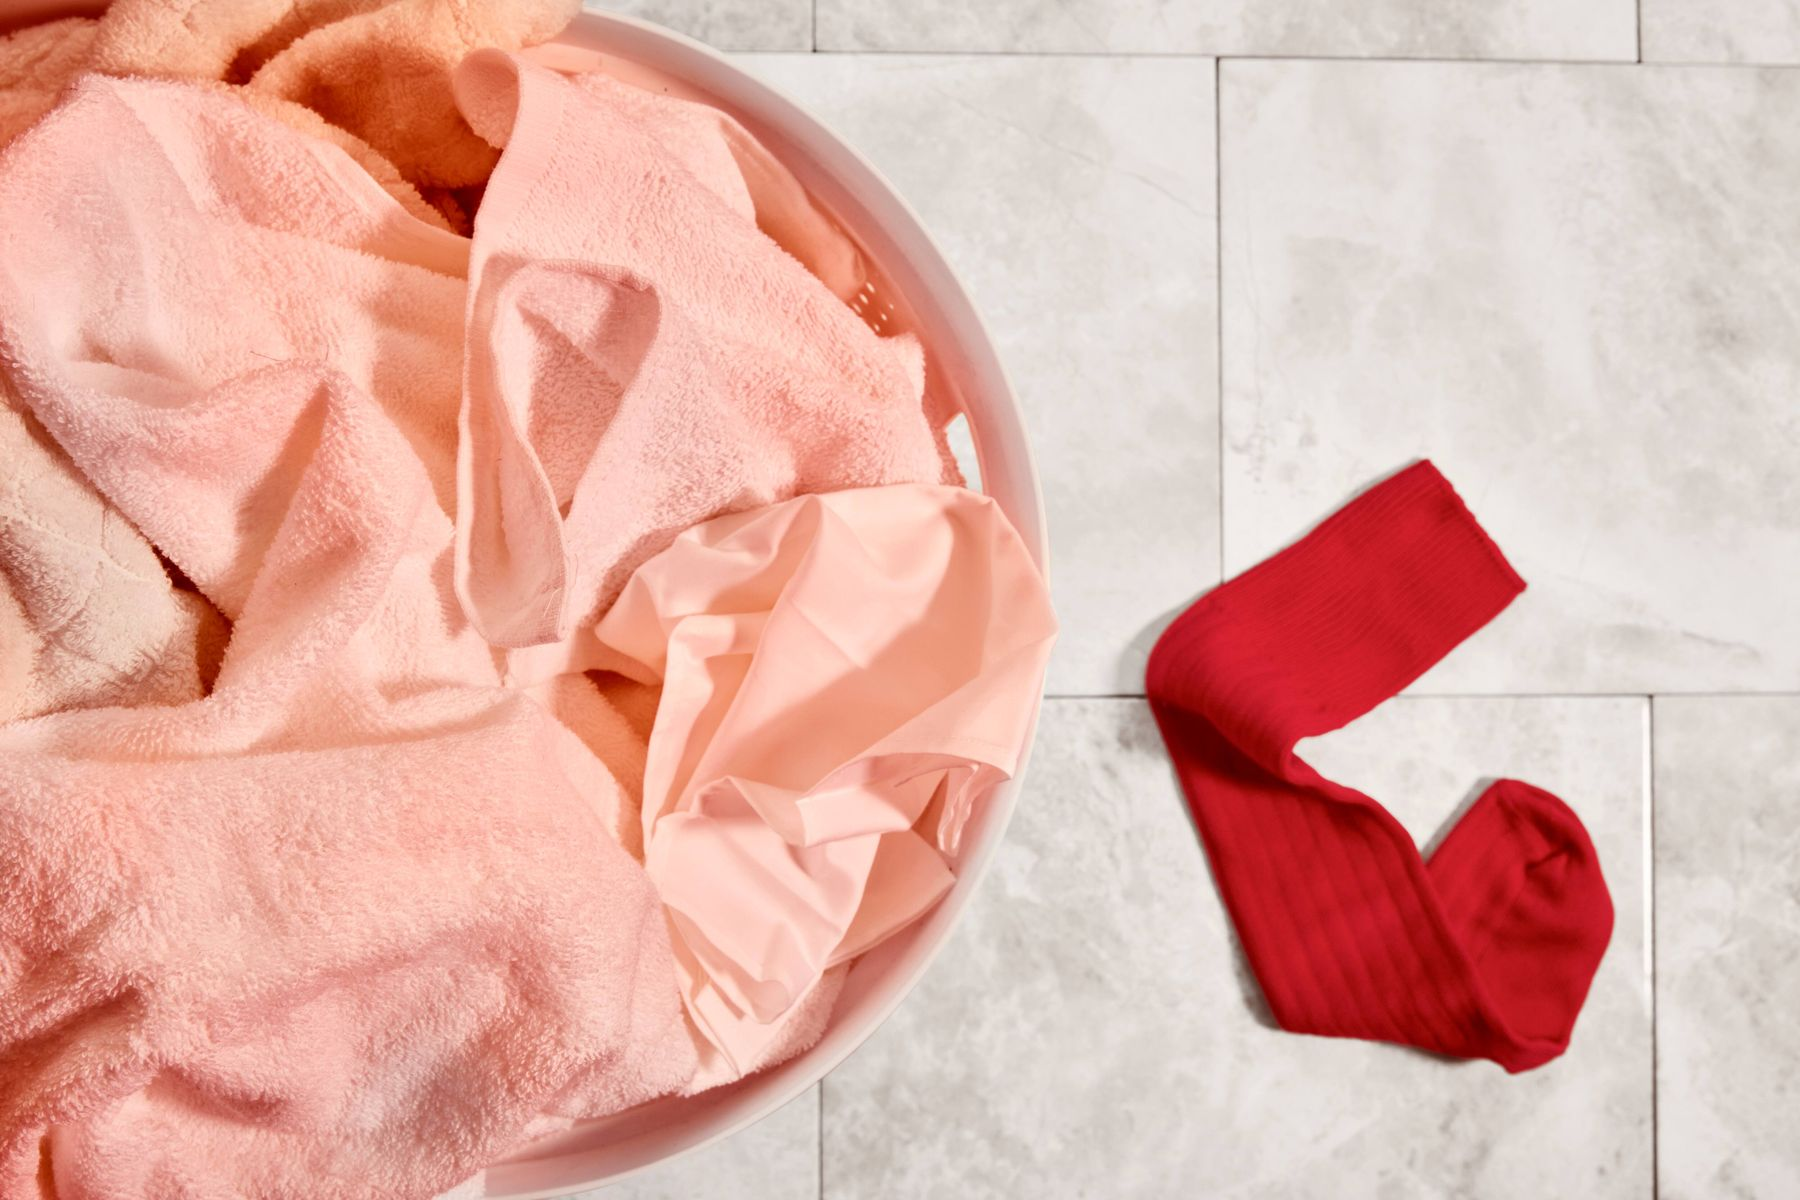 Baju terkena noda luntur merah muda